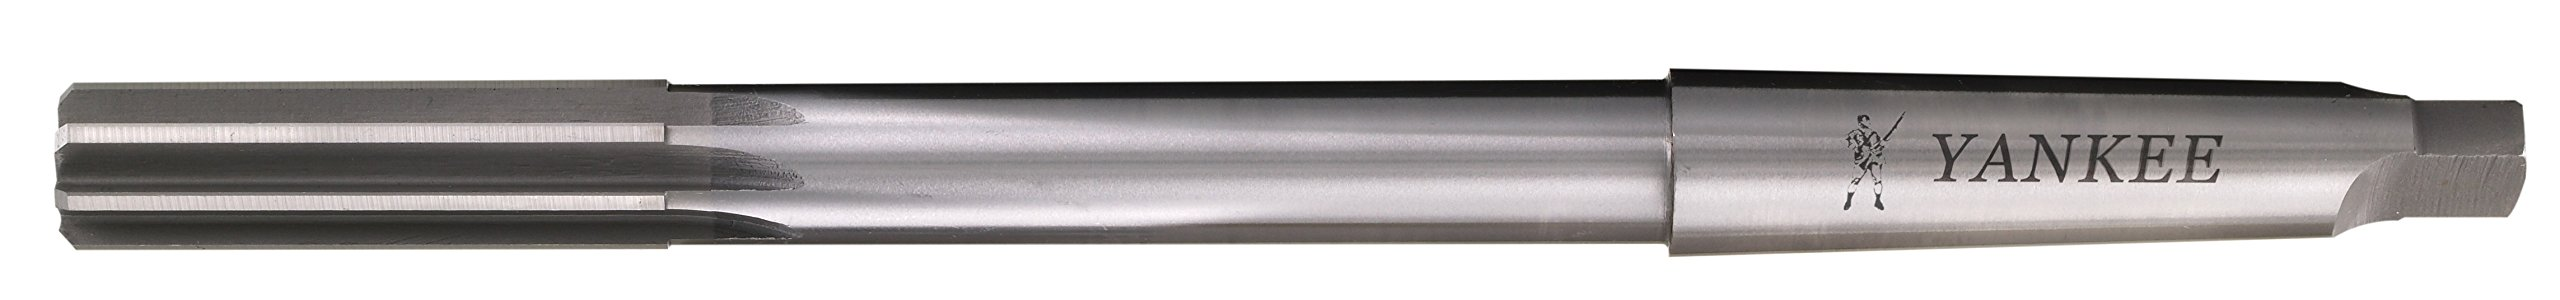 Yankee Corporation #7 Left Hand Spiral Taper Pin Reamer